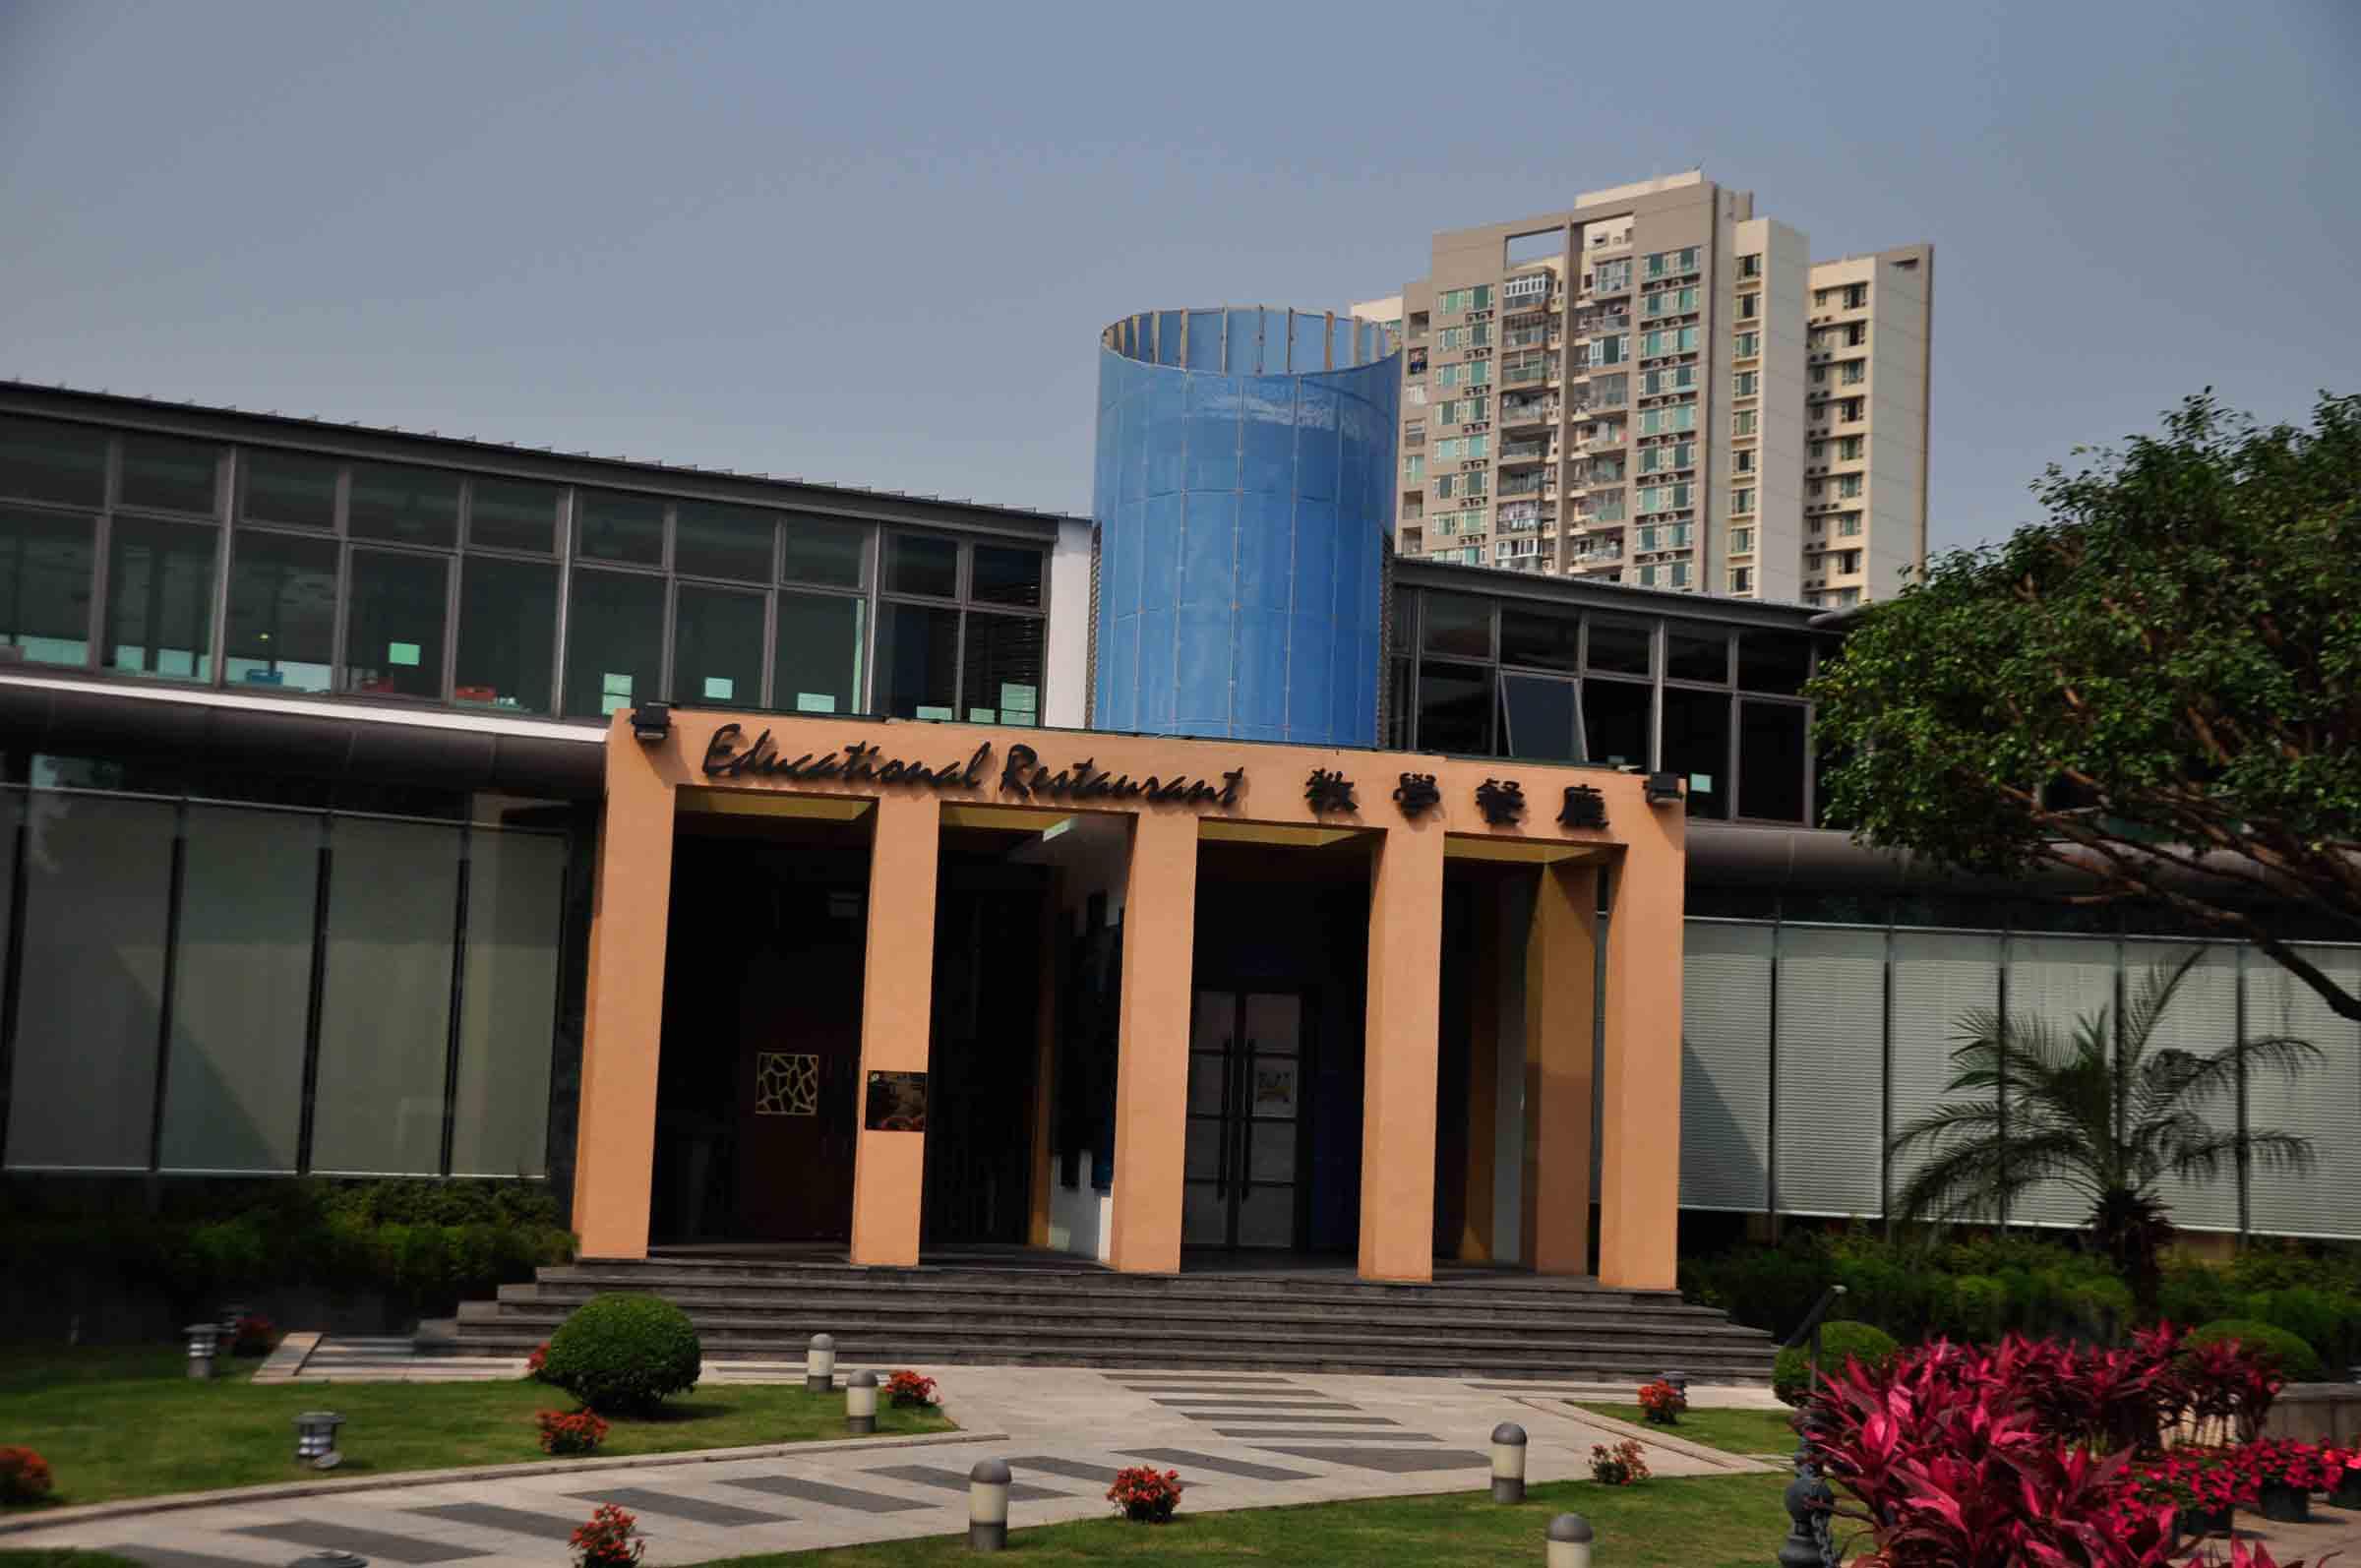 IFT Educational Restaurant Macau